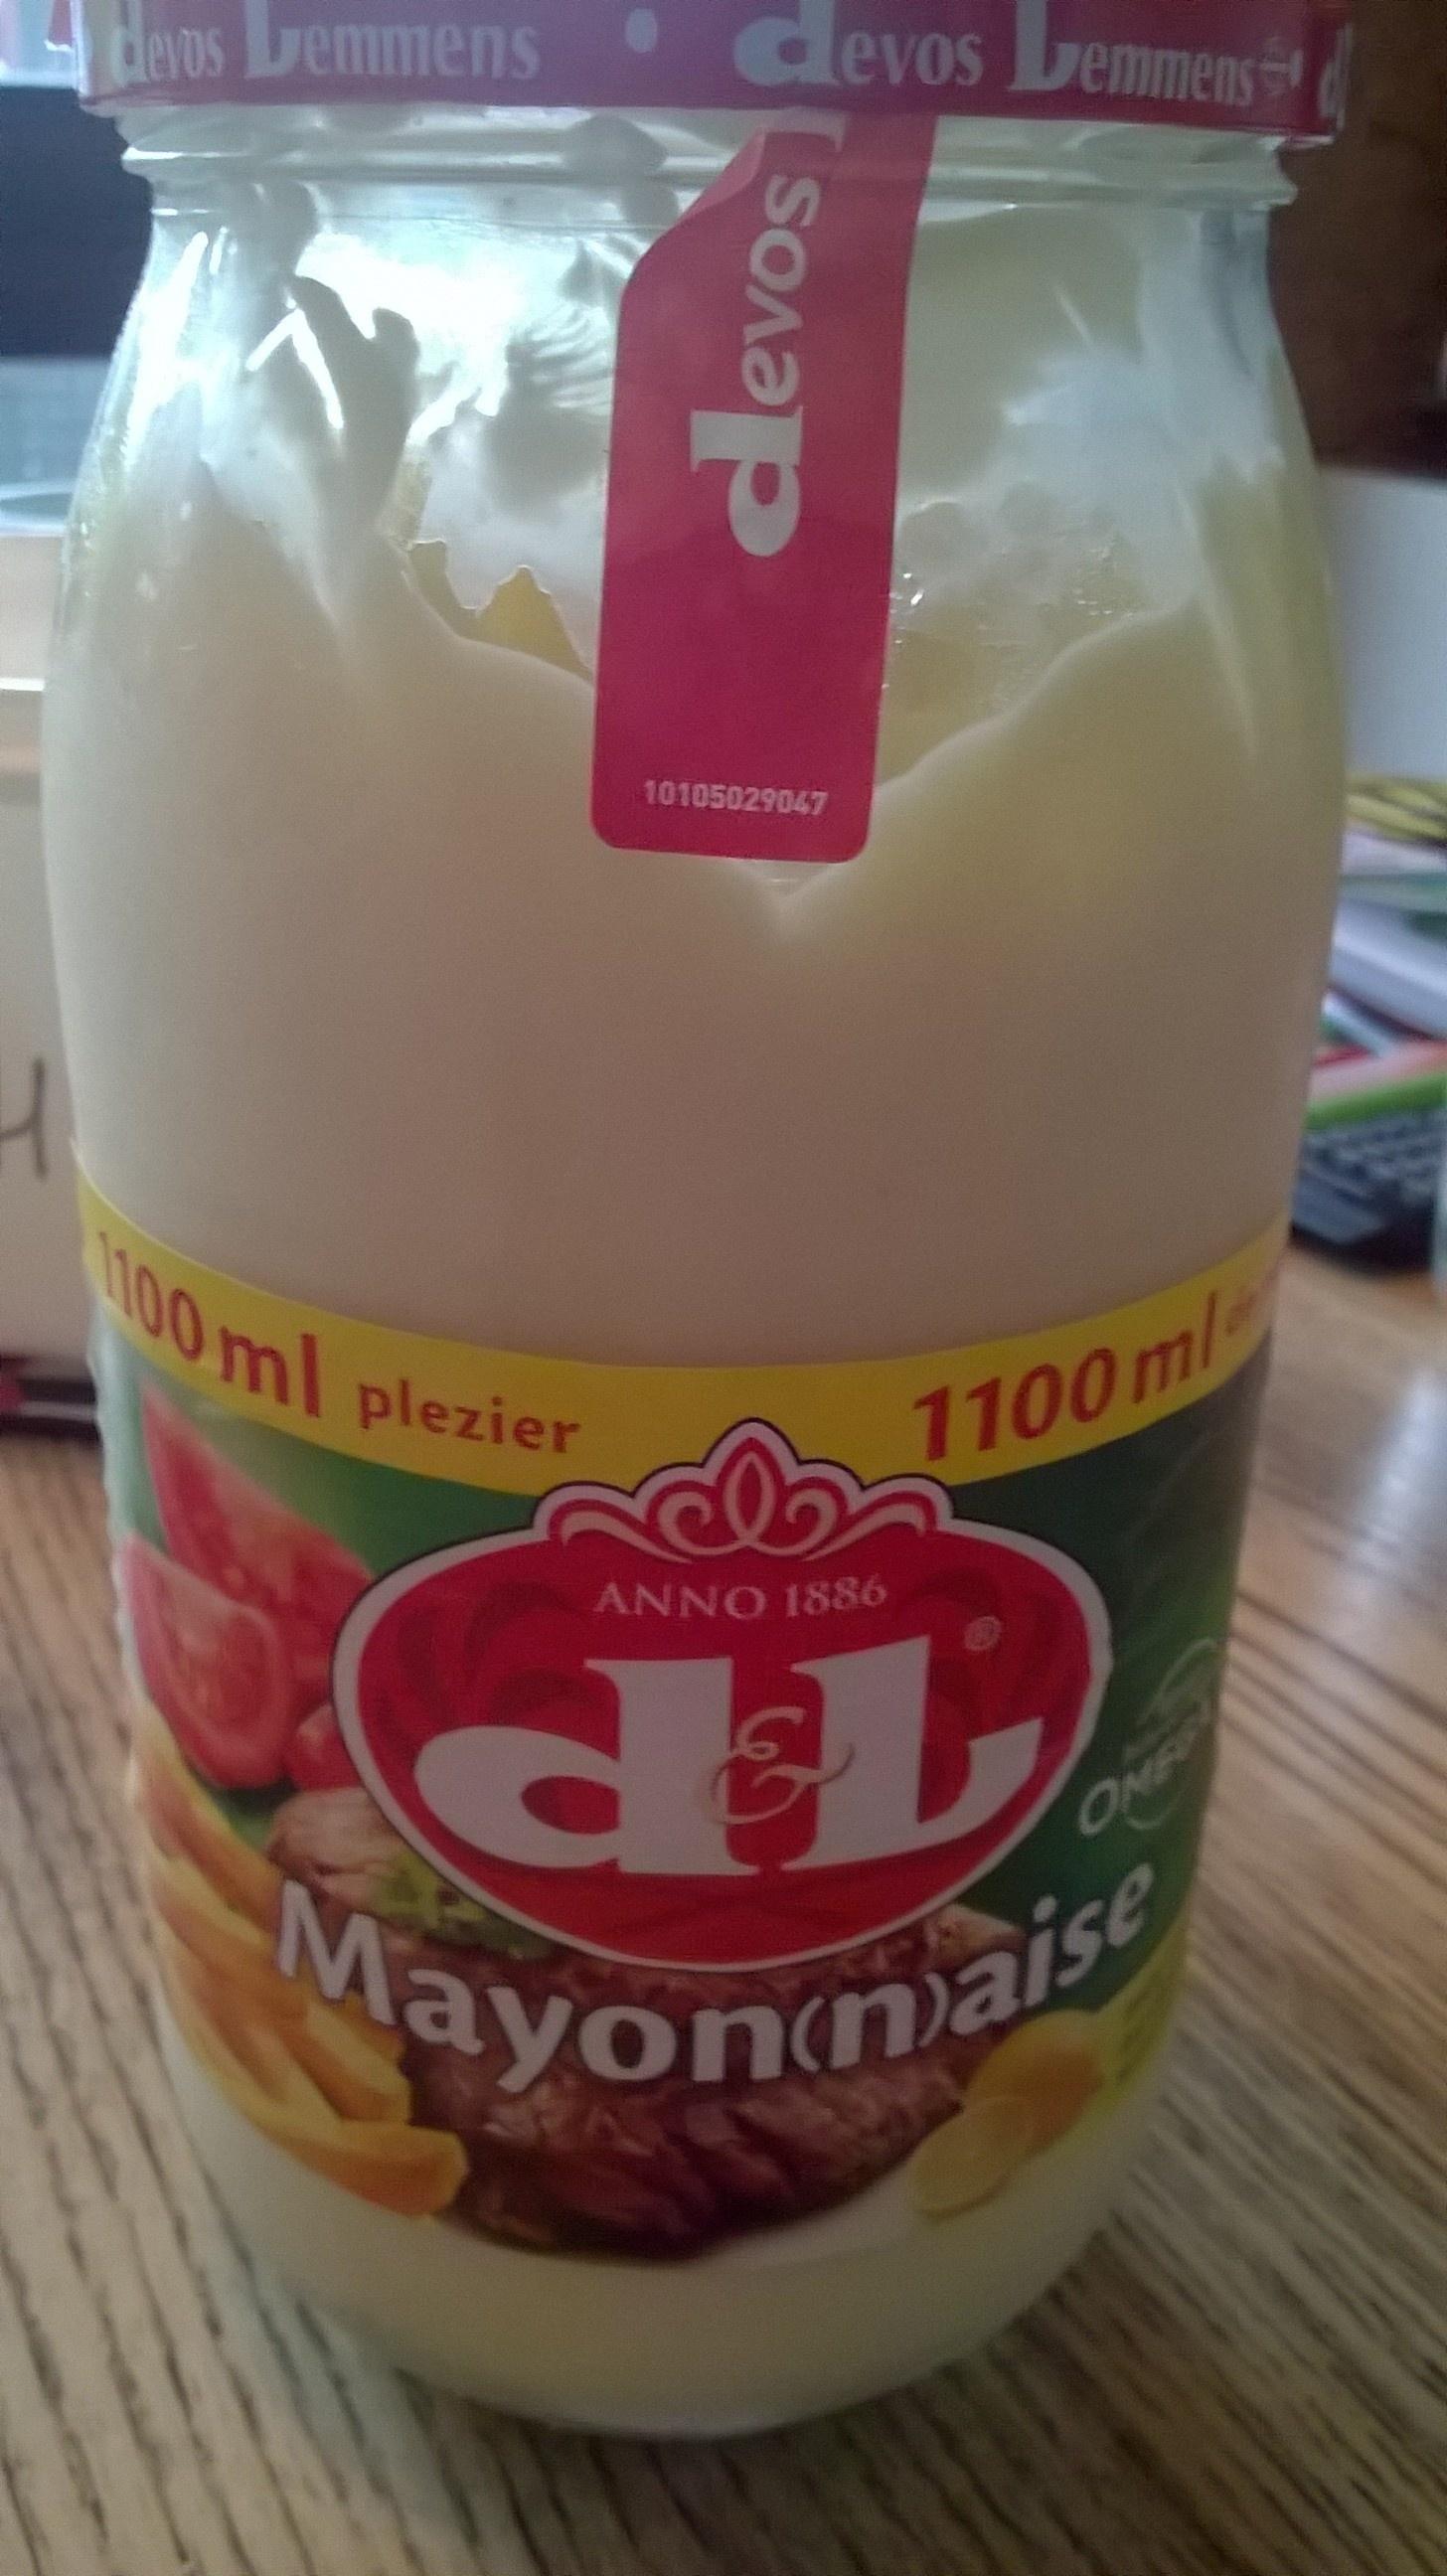 Mayonnaise Pot - Product